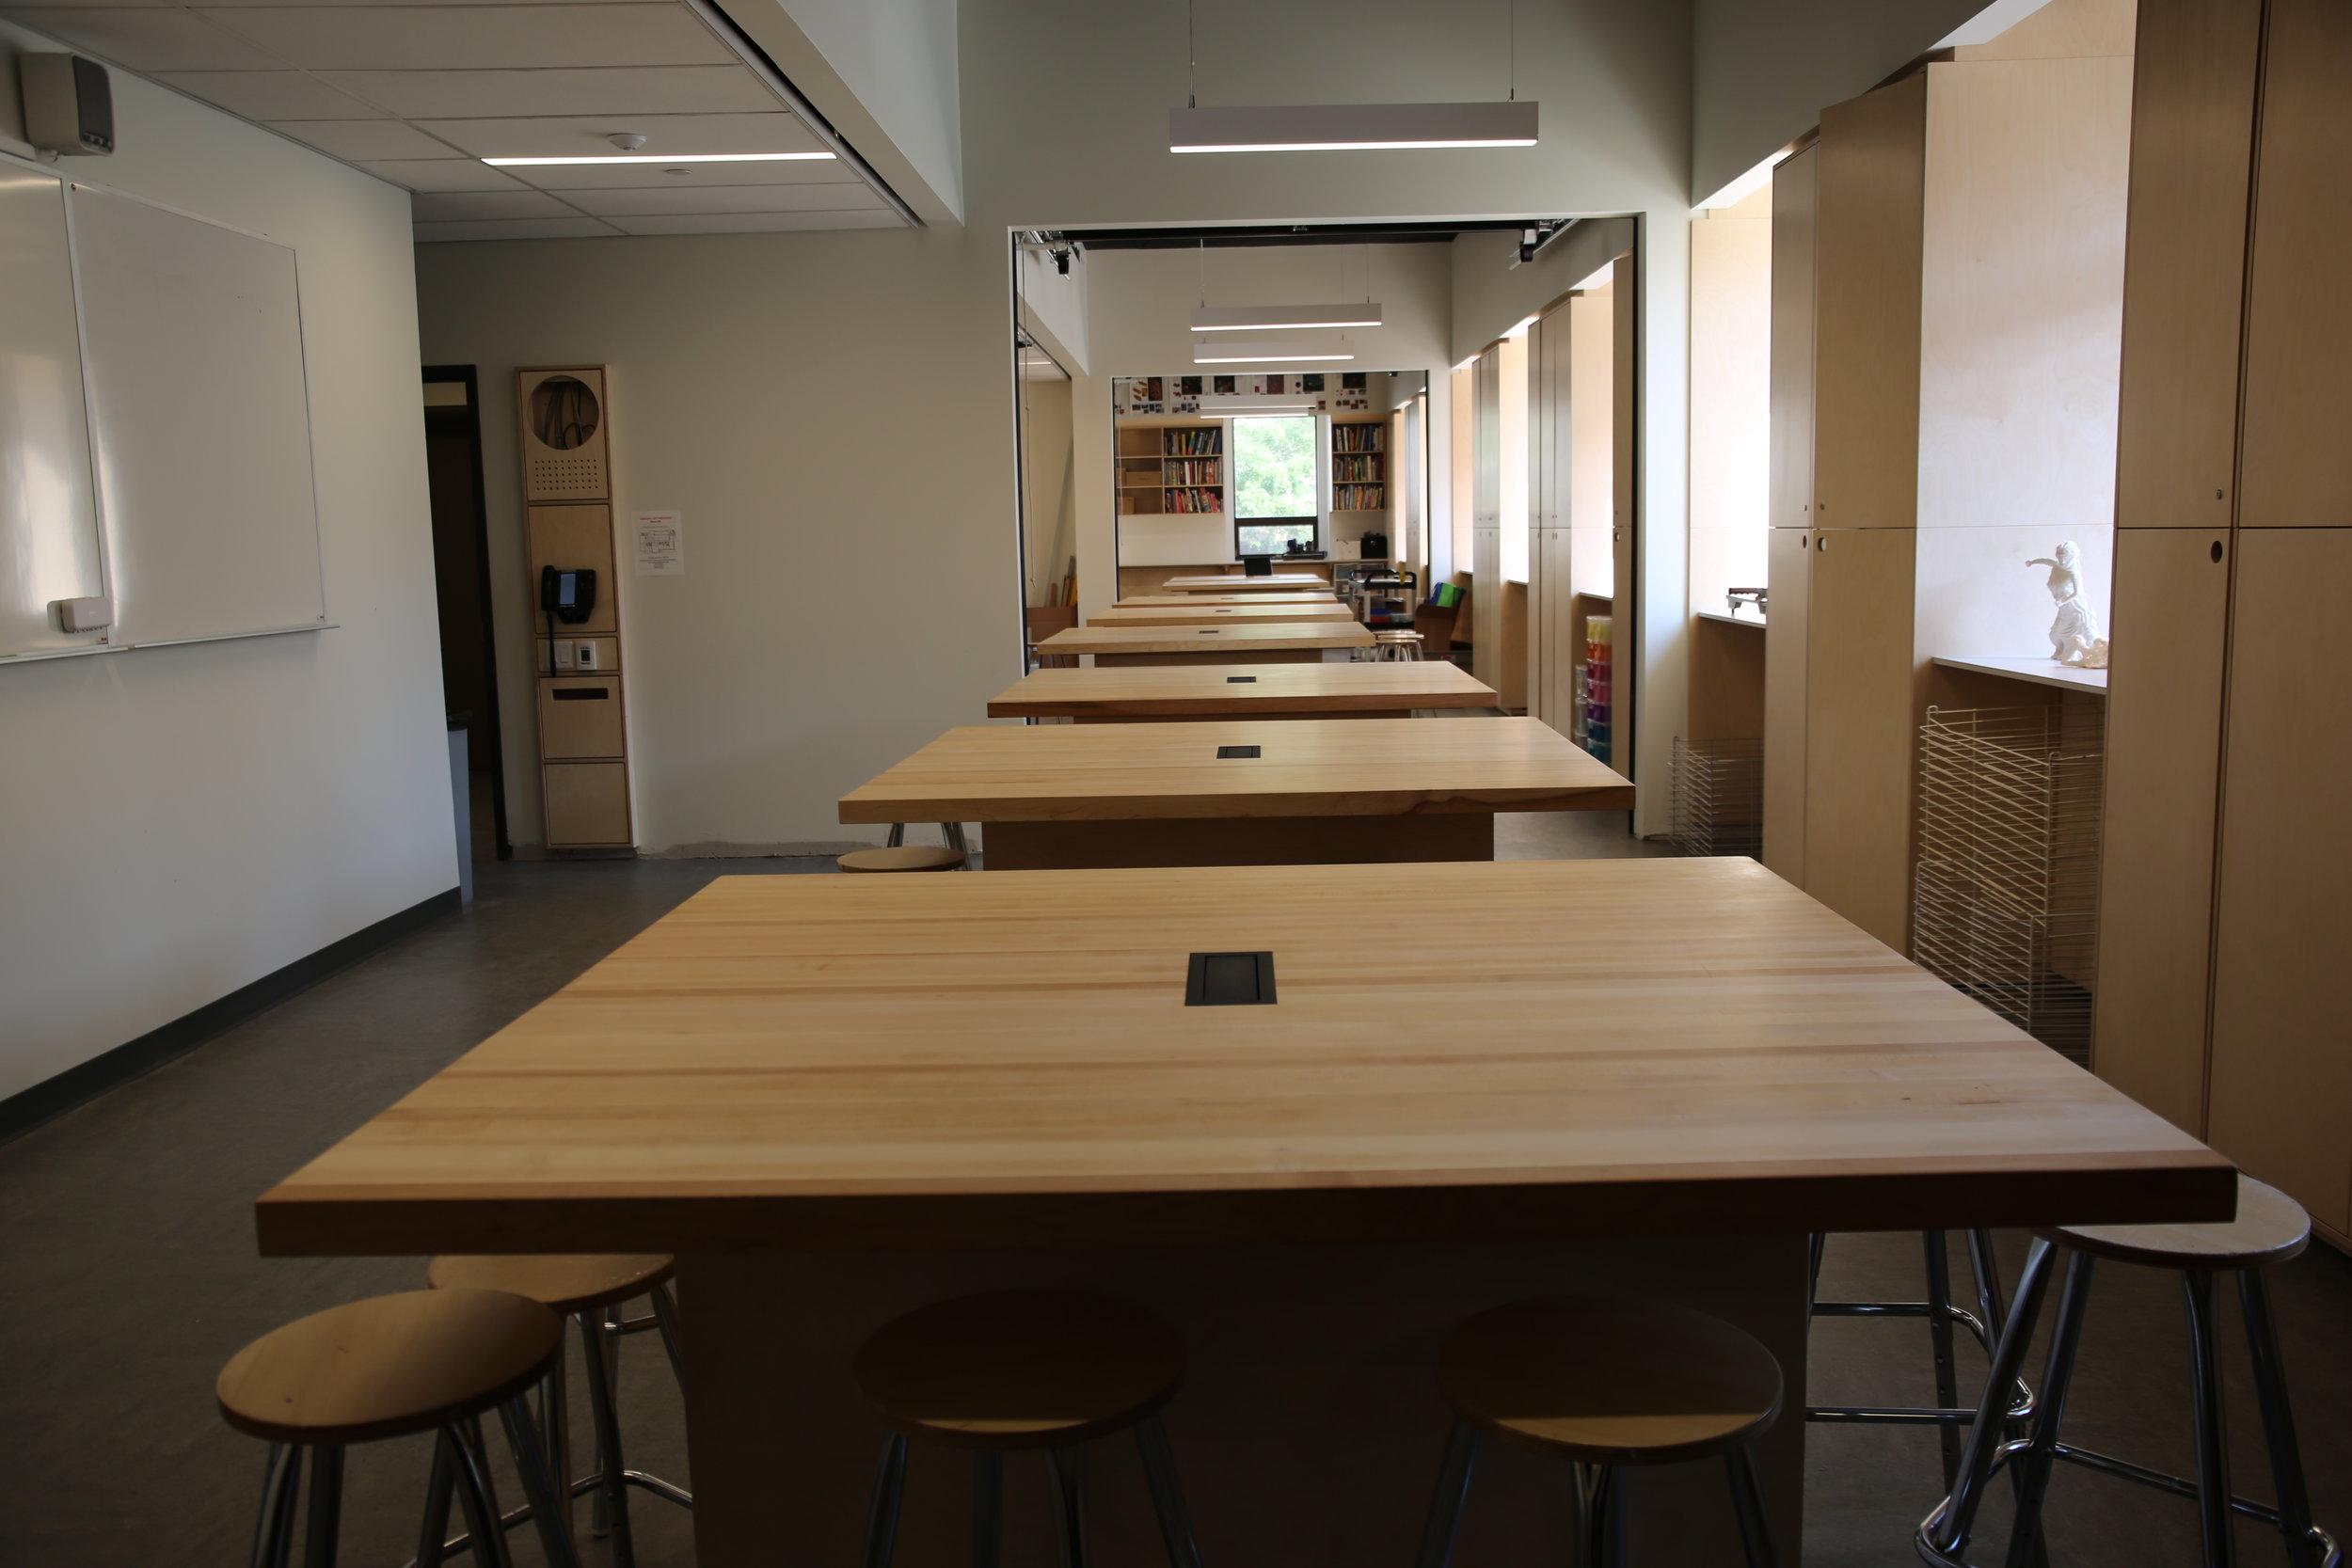 The Schad Design/Tech Lab